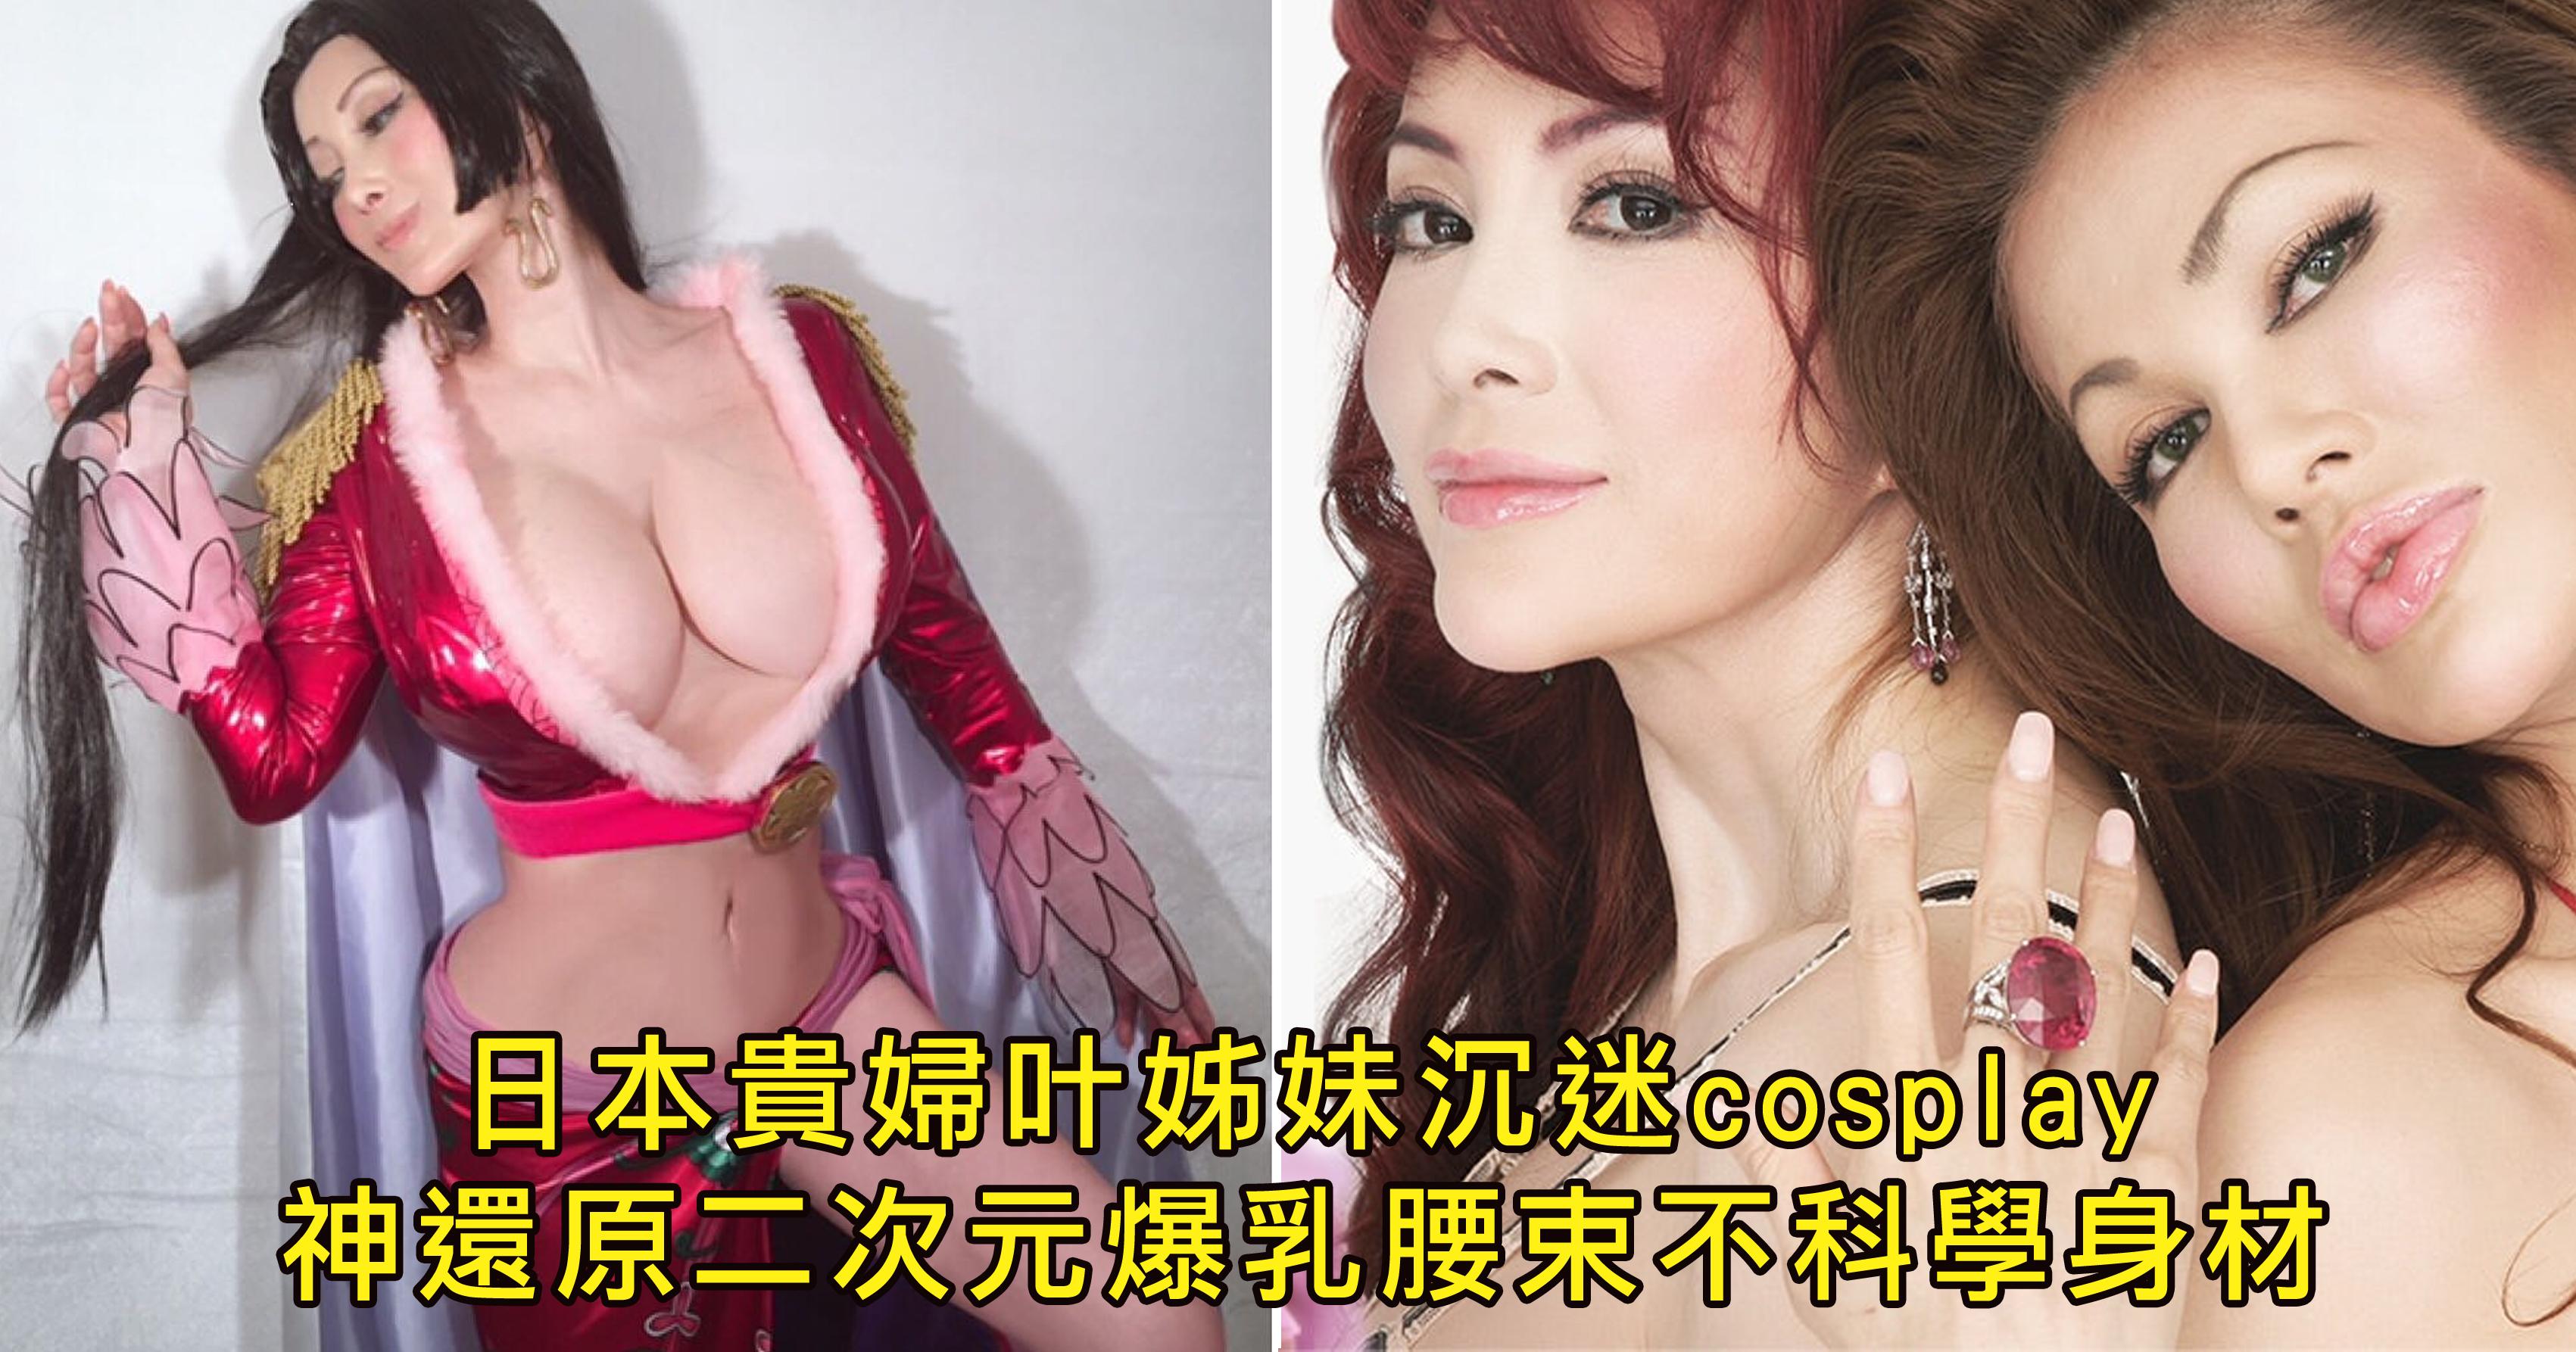 181029 216.jpg - 這才是真正的蛇姬!日本貴婦迷上cosplay,神還原二次元爆乳身材